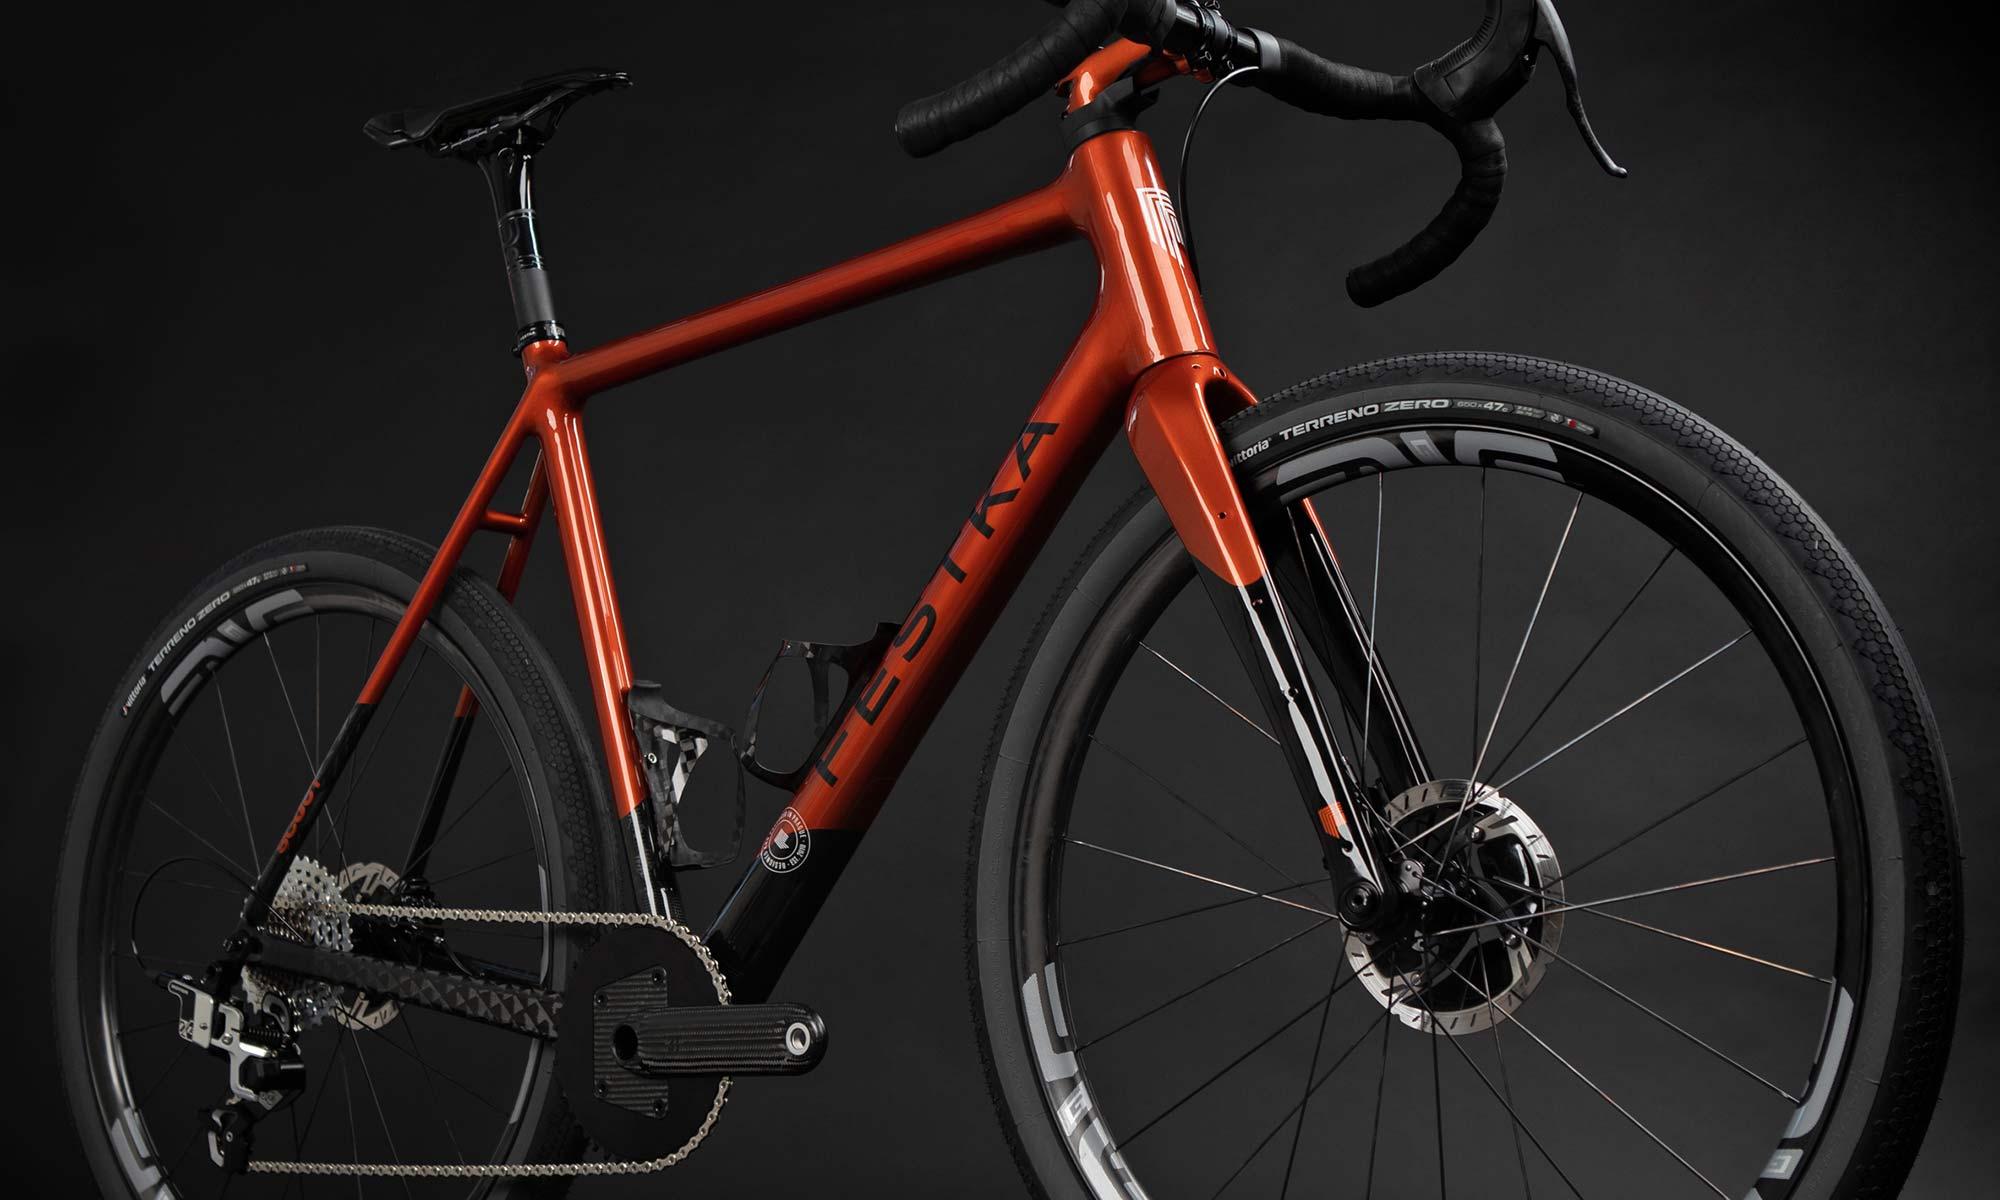 Festka Scout custom carbon adventure gravel bike,Columbus Futura Cross+ fork